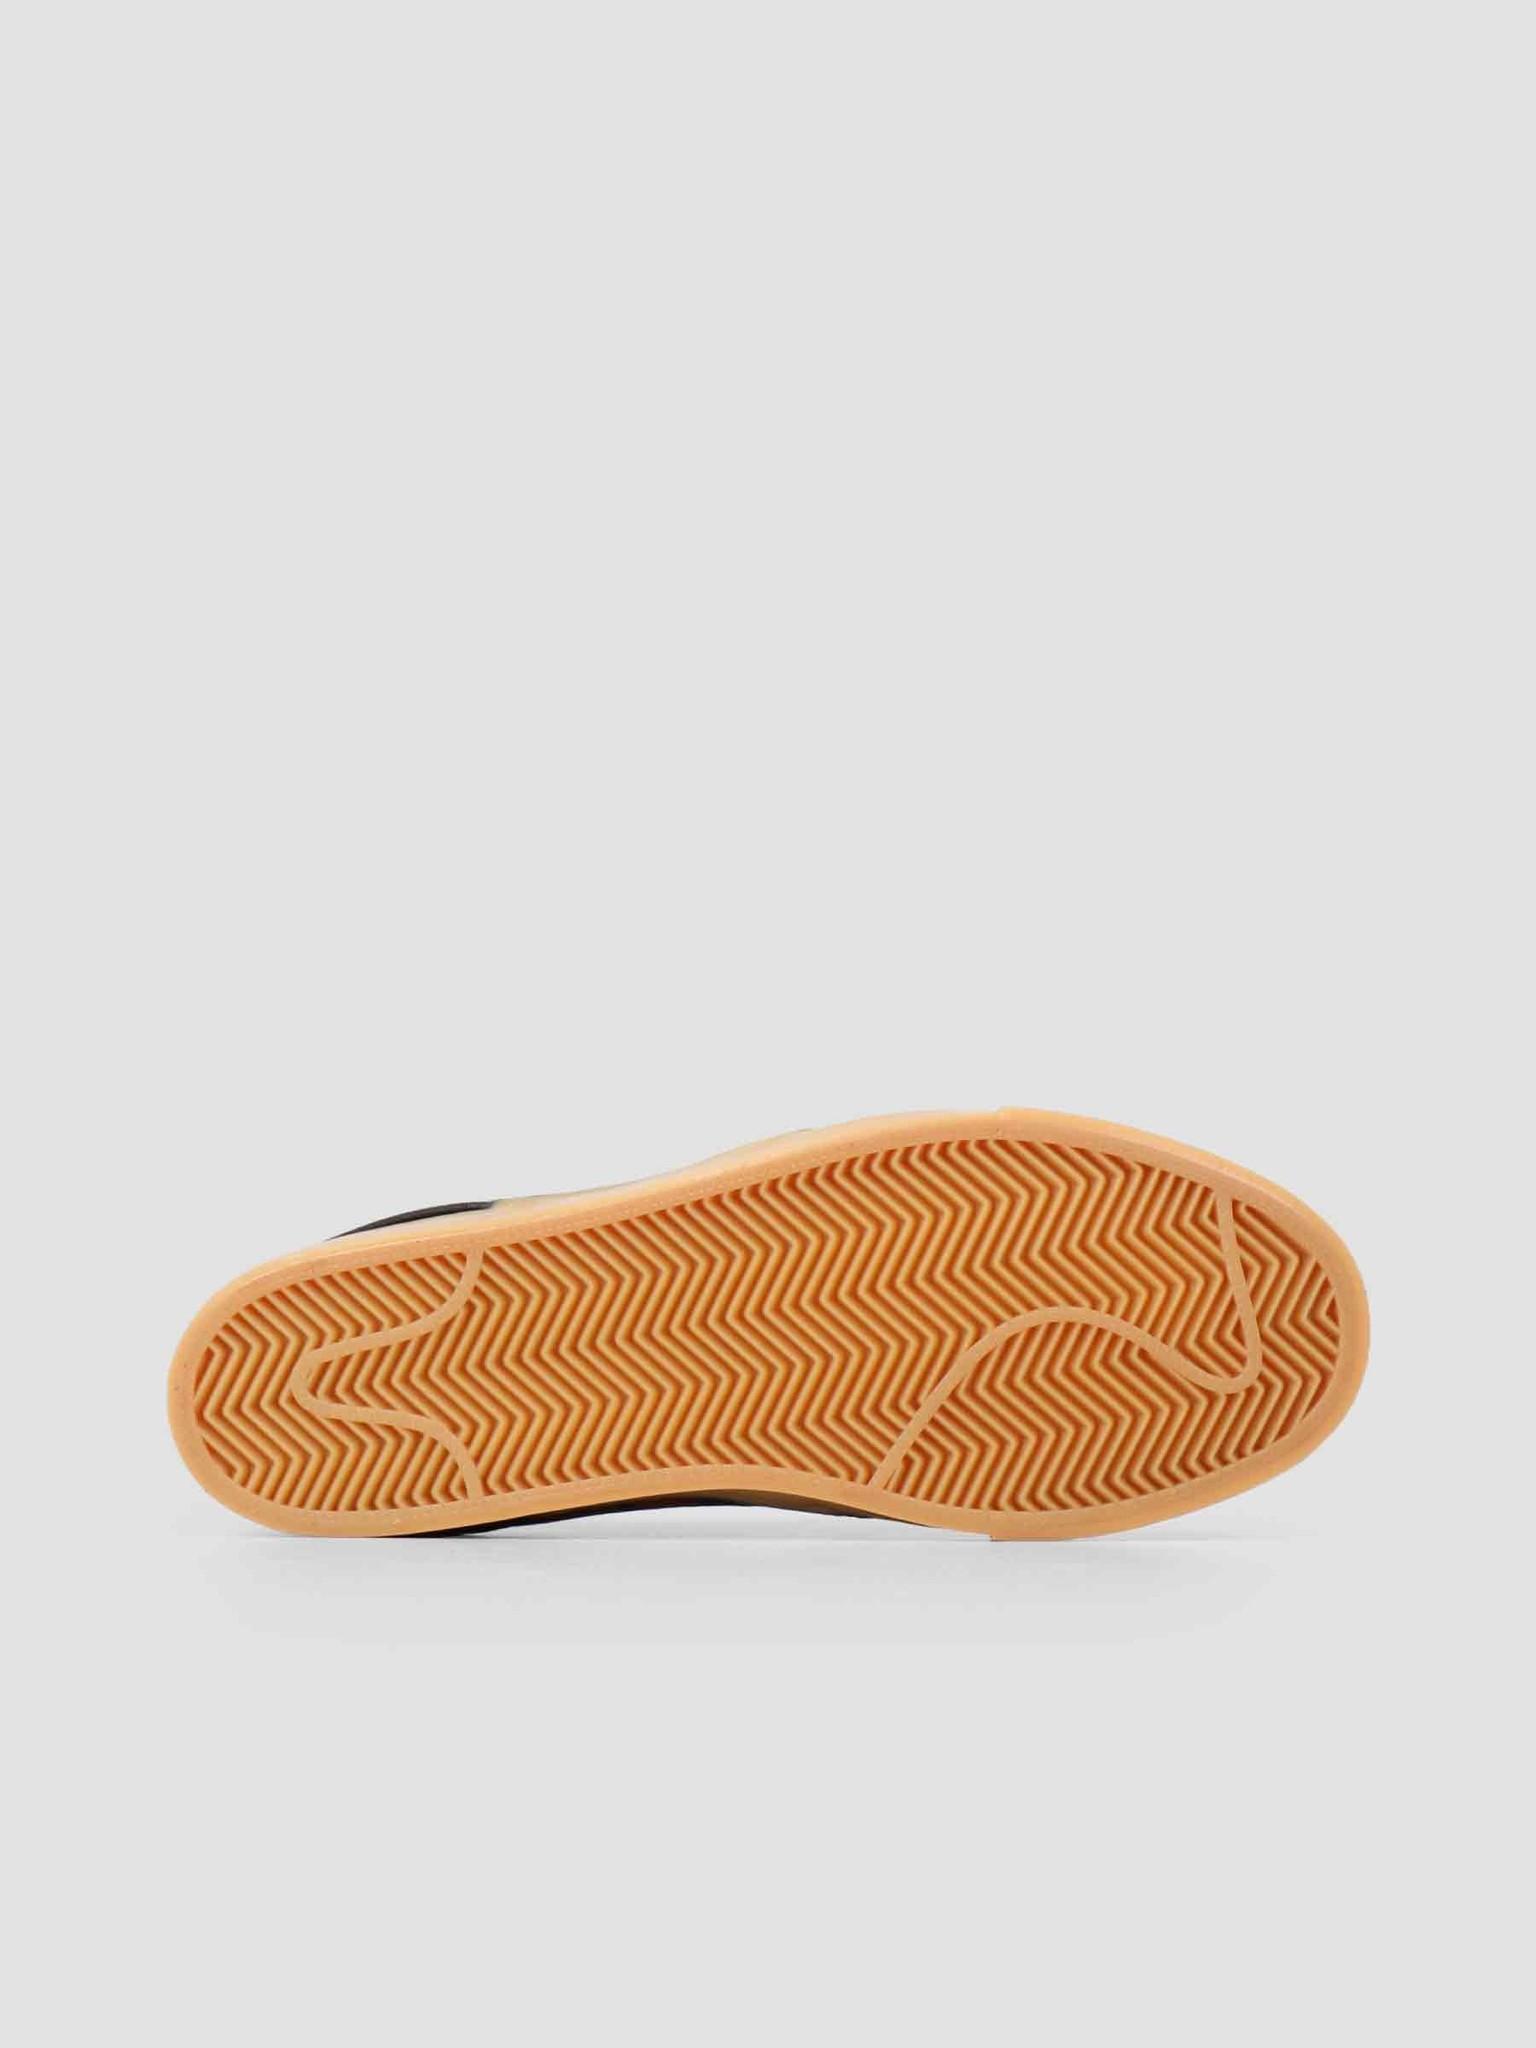 Nike Nike SB Zoom Stefan Janoski Canvas Premium Multi Velvet Brown 705190-900